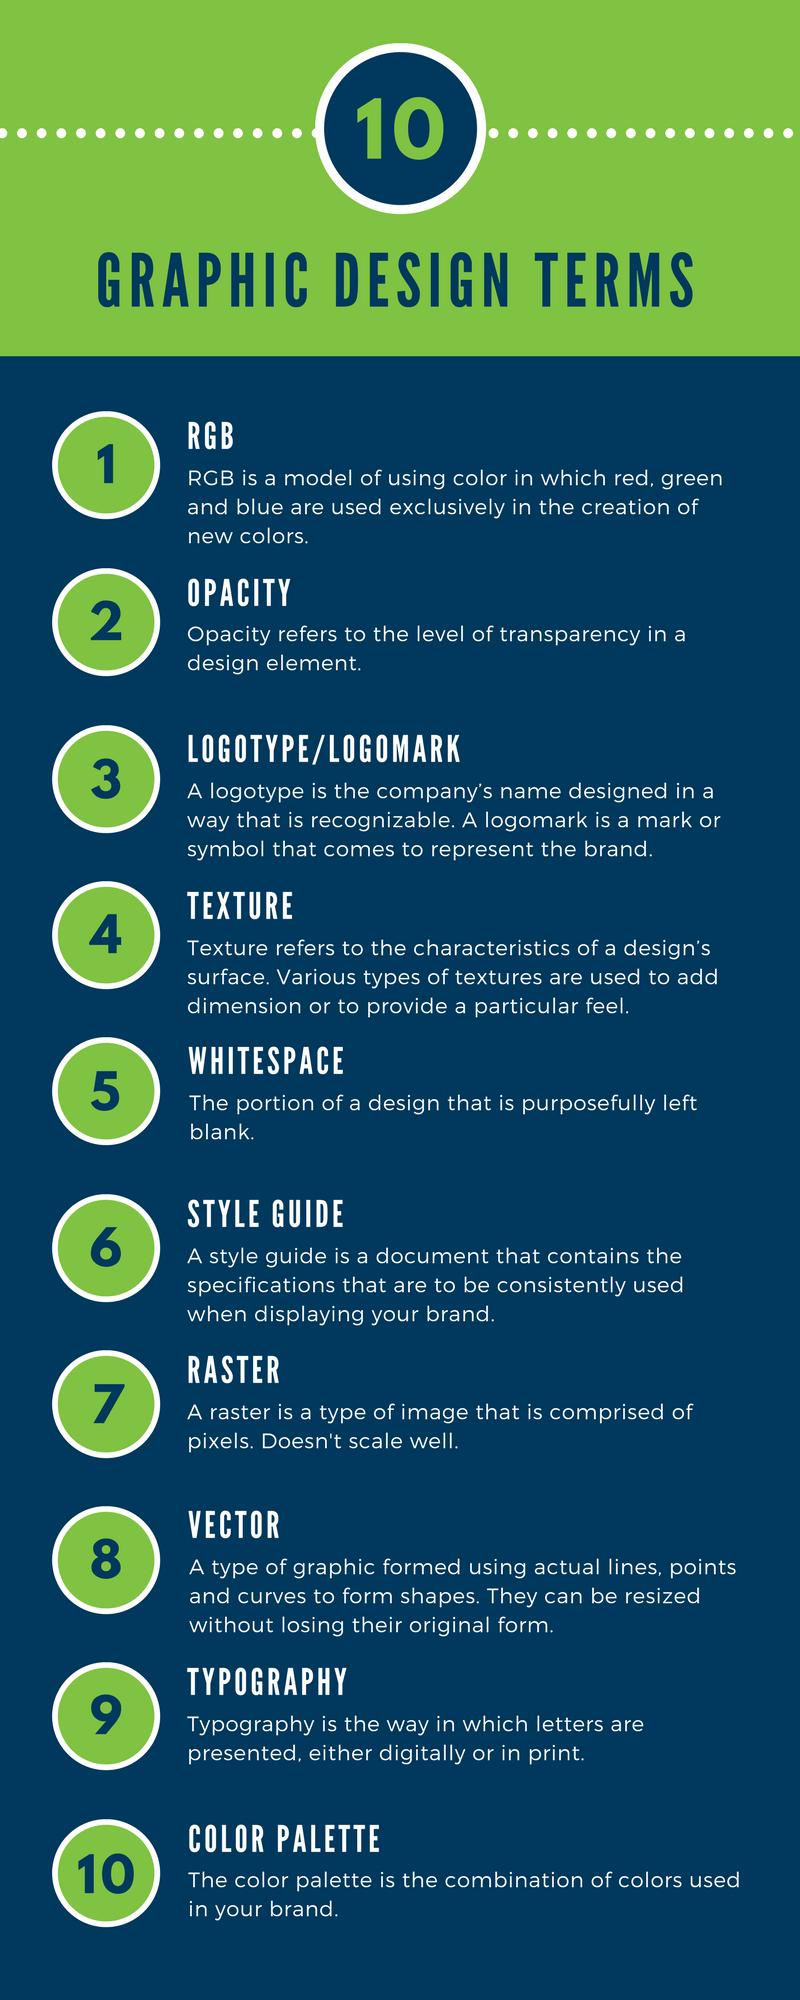 10 graphic design terms